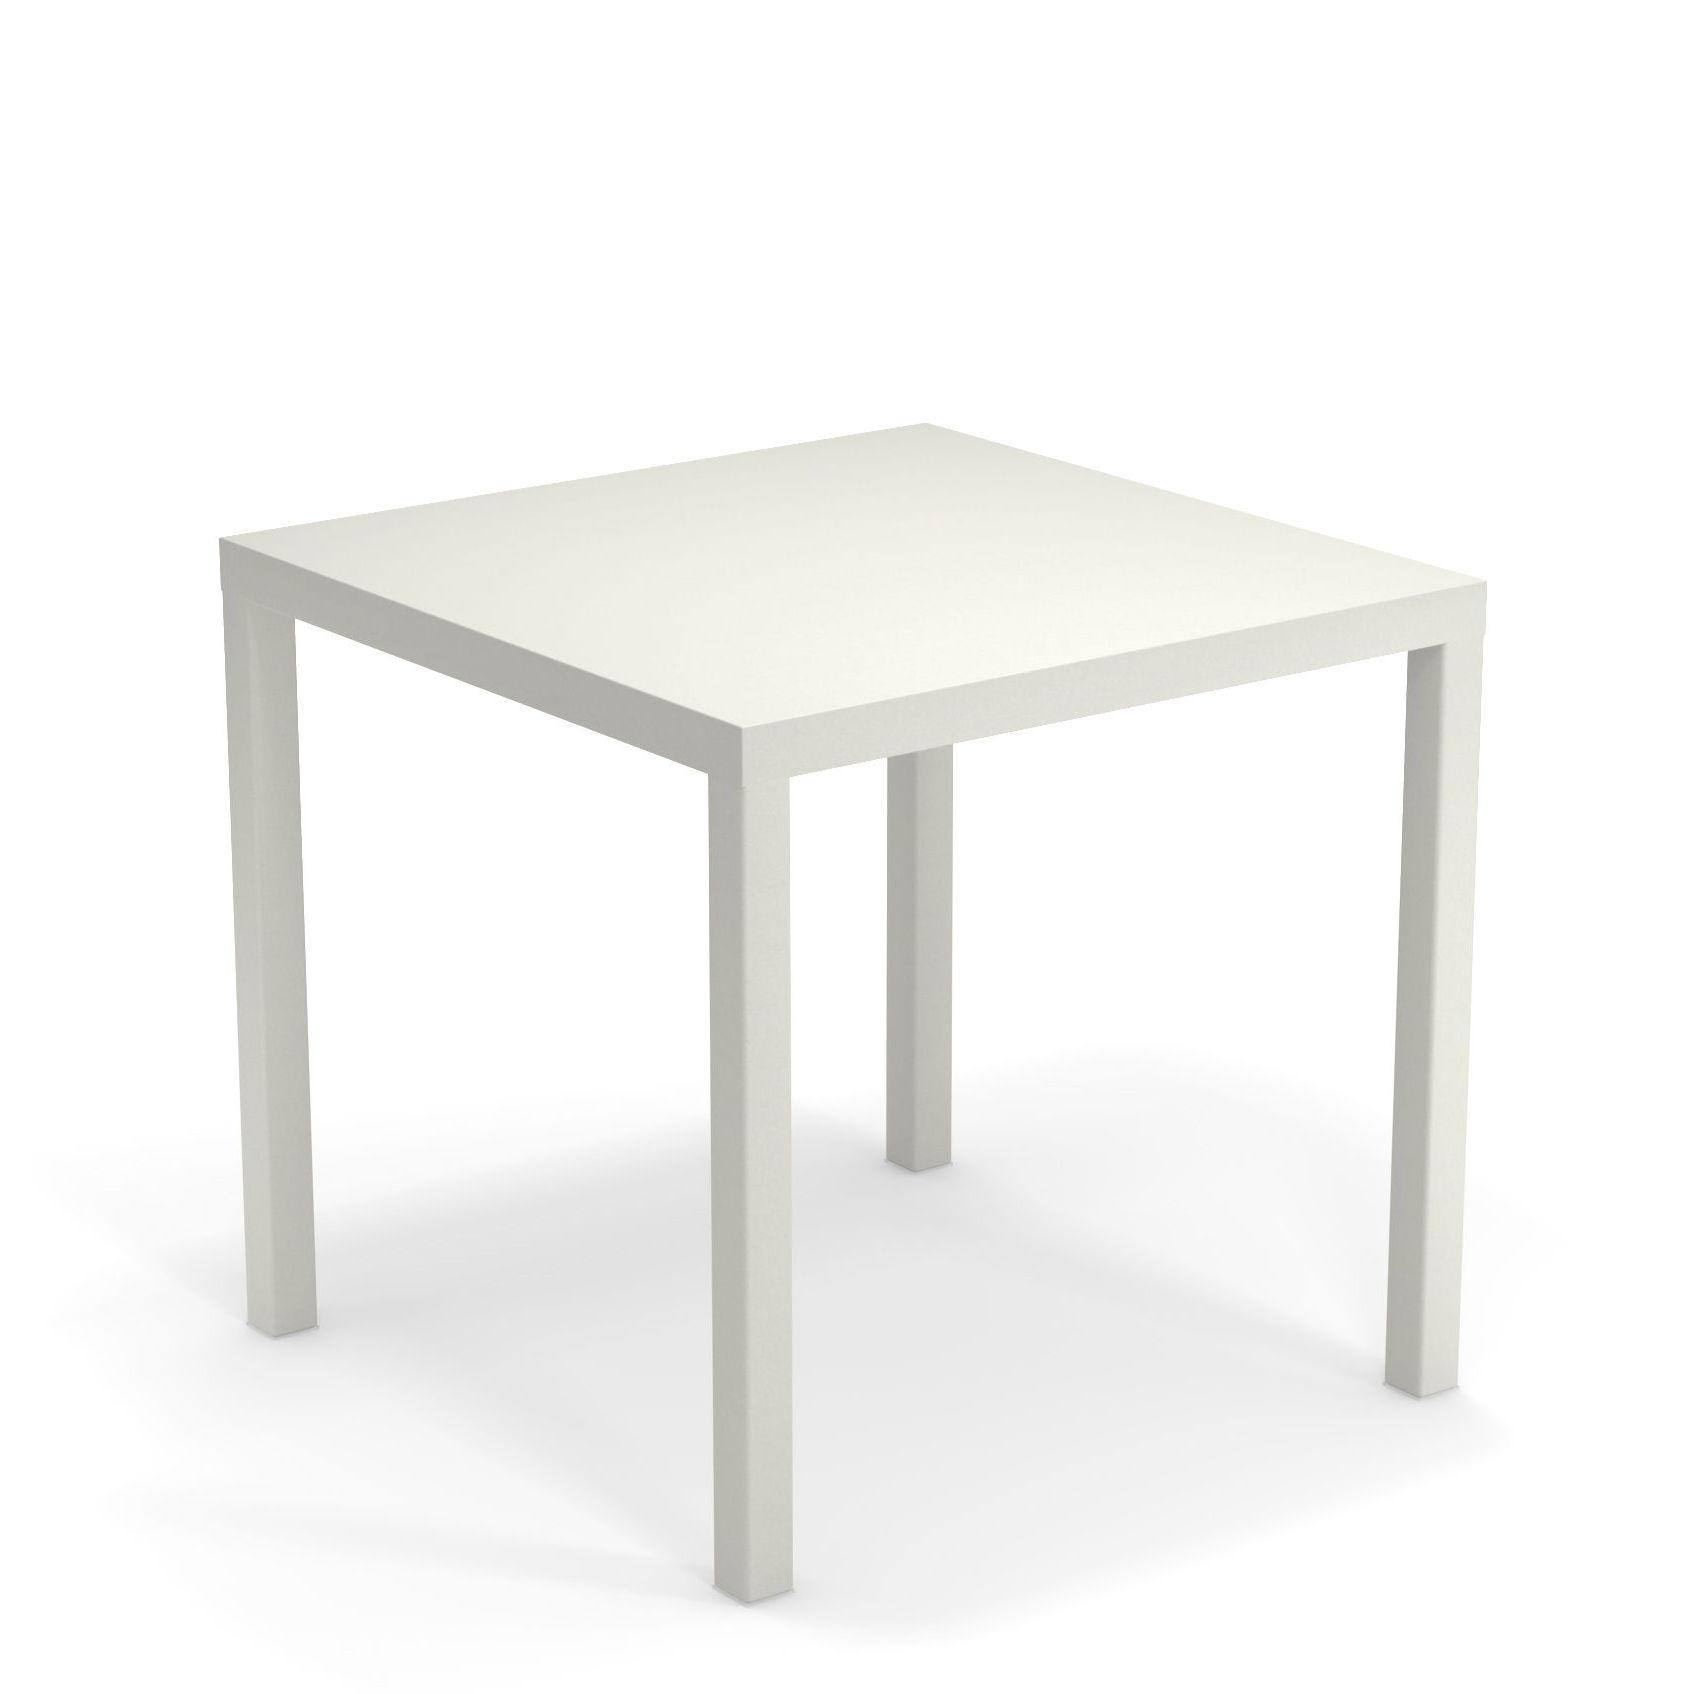 Outdoor - Tables de jardin - Table carrée Nova / Métal - 80 x 80 cm - Emu - Blanc - Acier verni